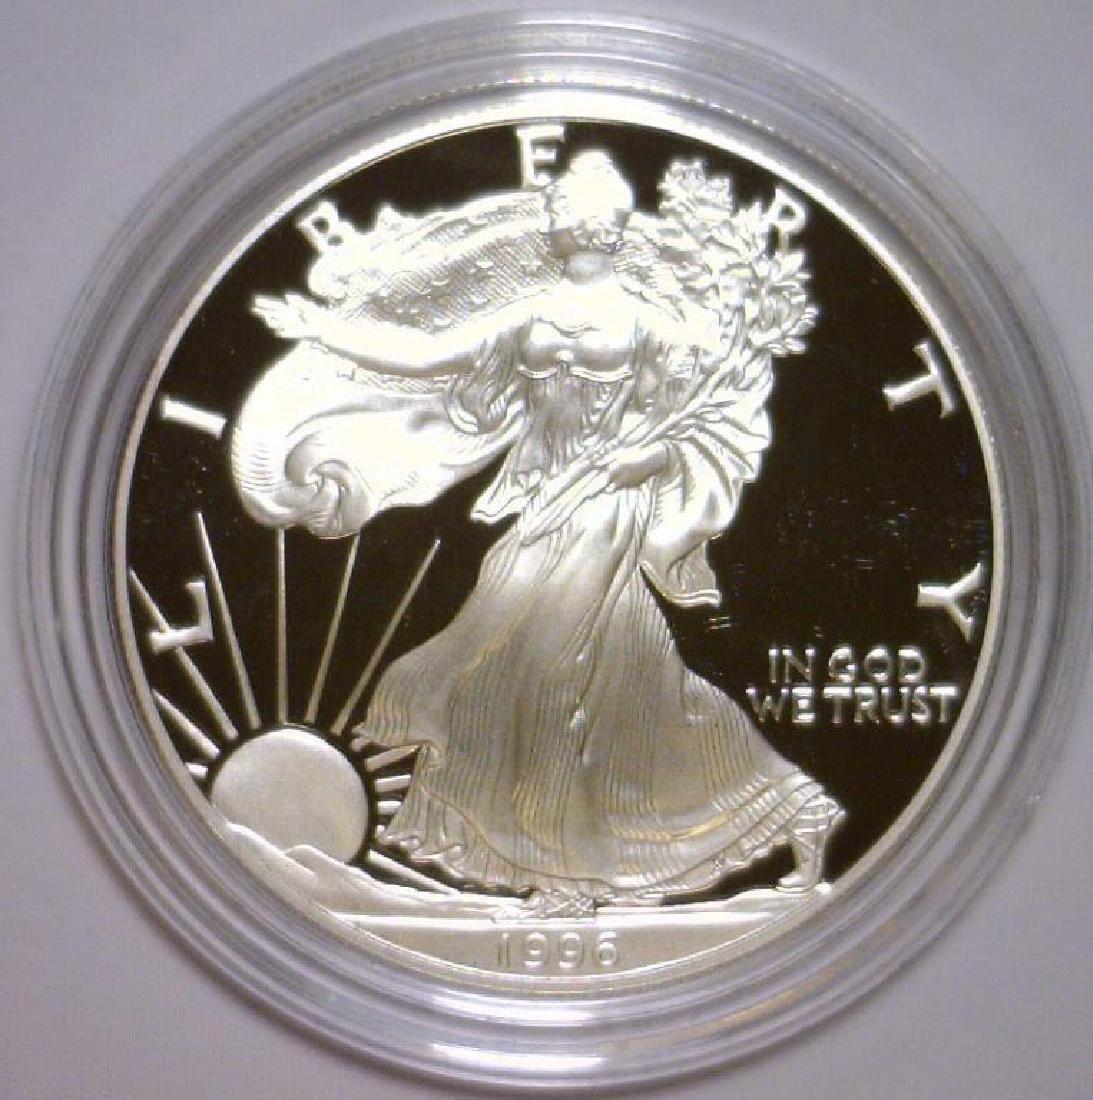 1996 Silver American Eagle Proof with Box & COA